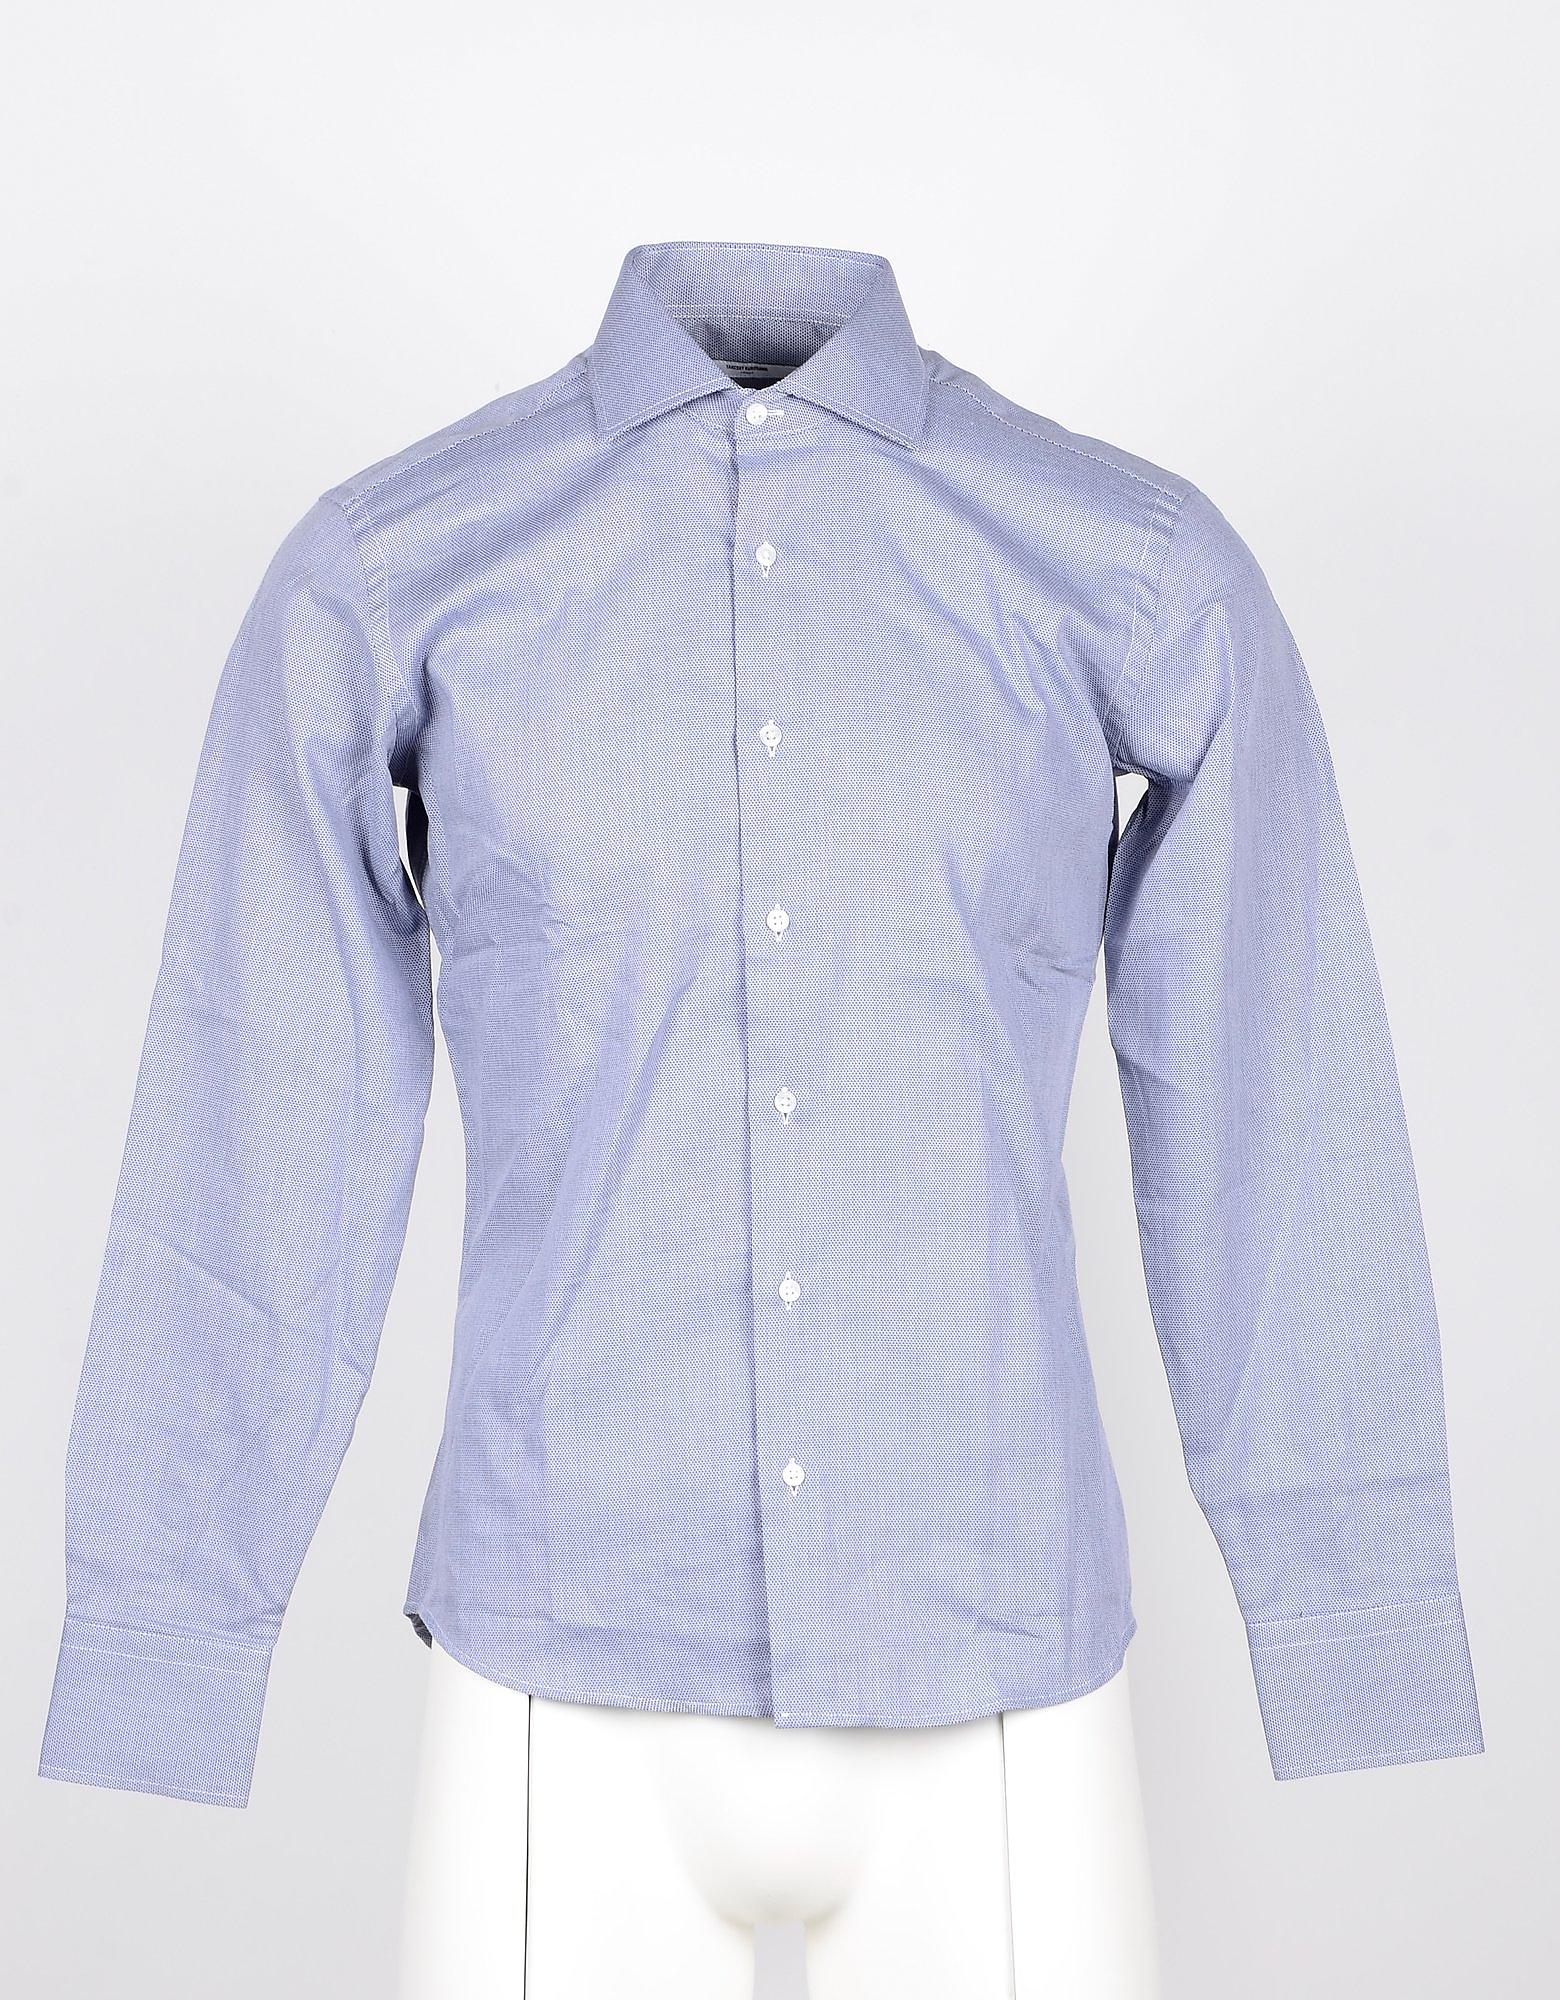 Takeshy Kurosawa Designer Shirts, Gray Cotton Men's Shirt